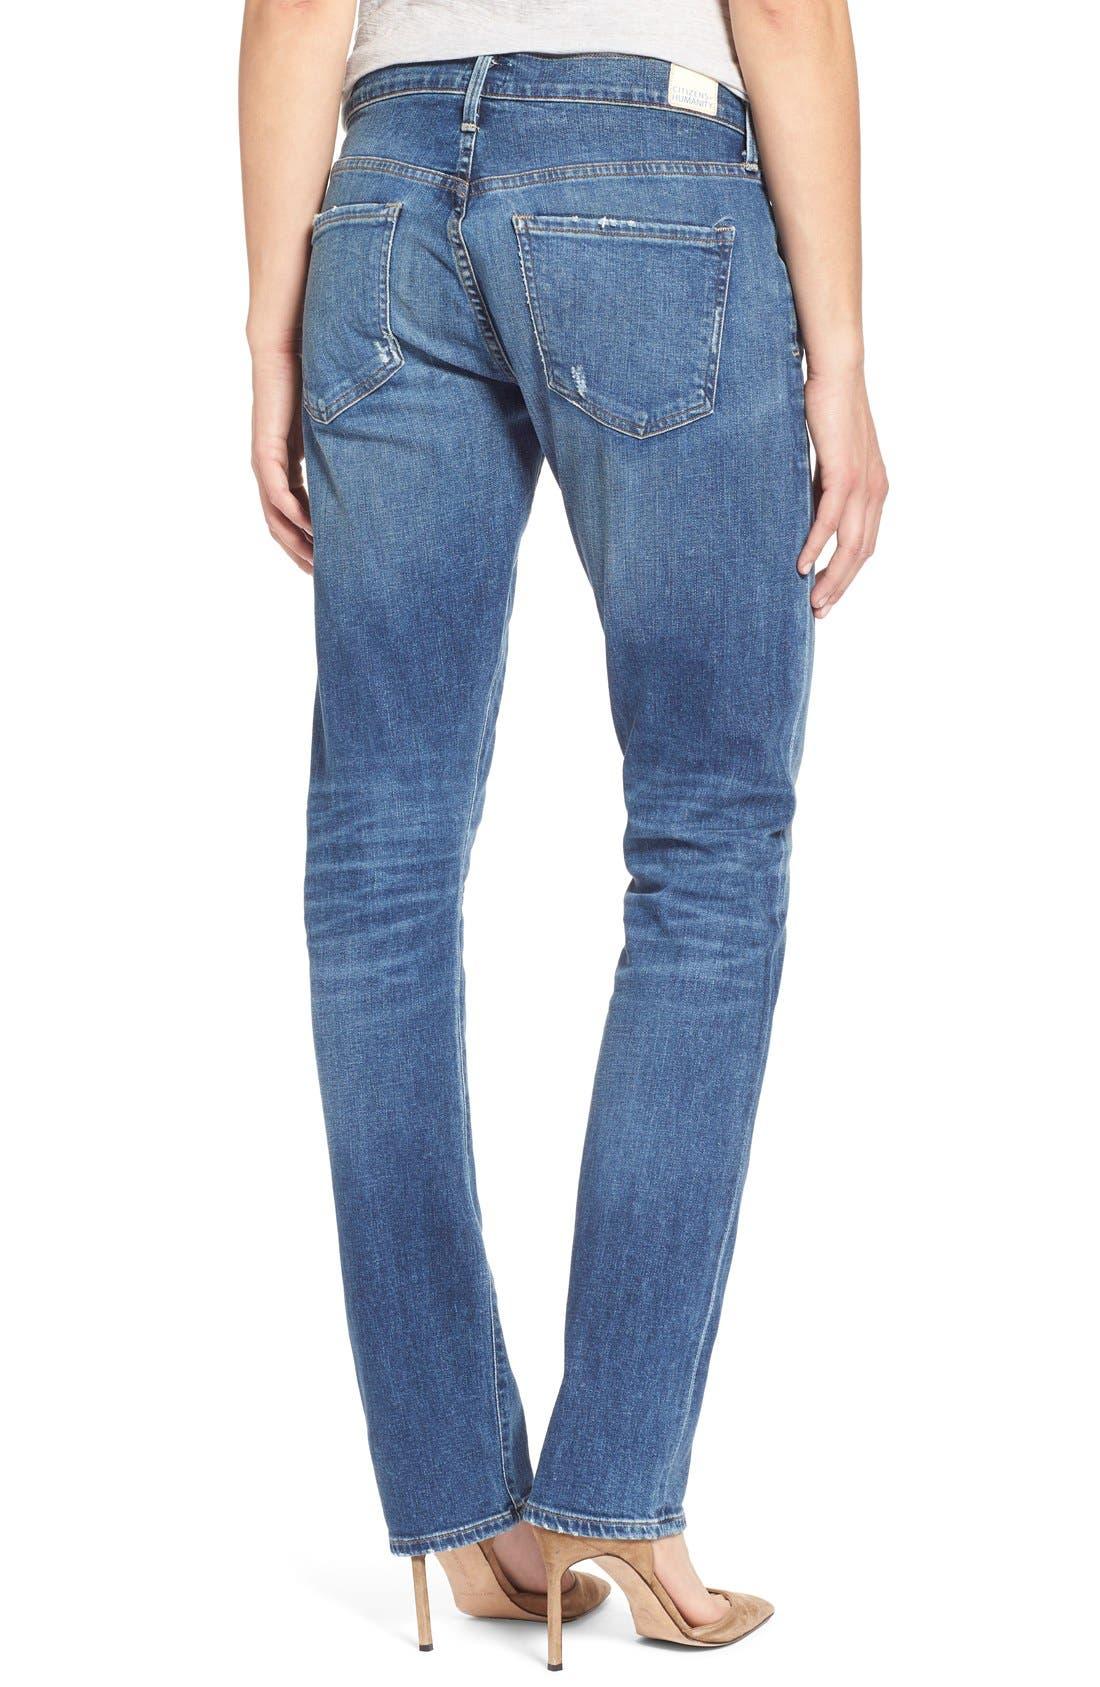 'Emerson Long' Slim Boyfriend Jeans,                             Alternate thumbnail 2, color,                             421